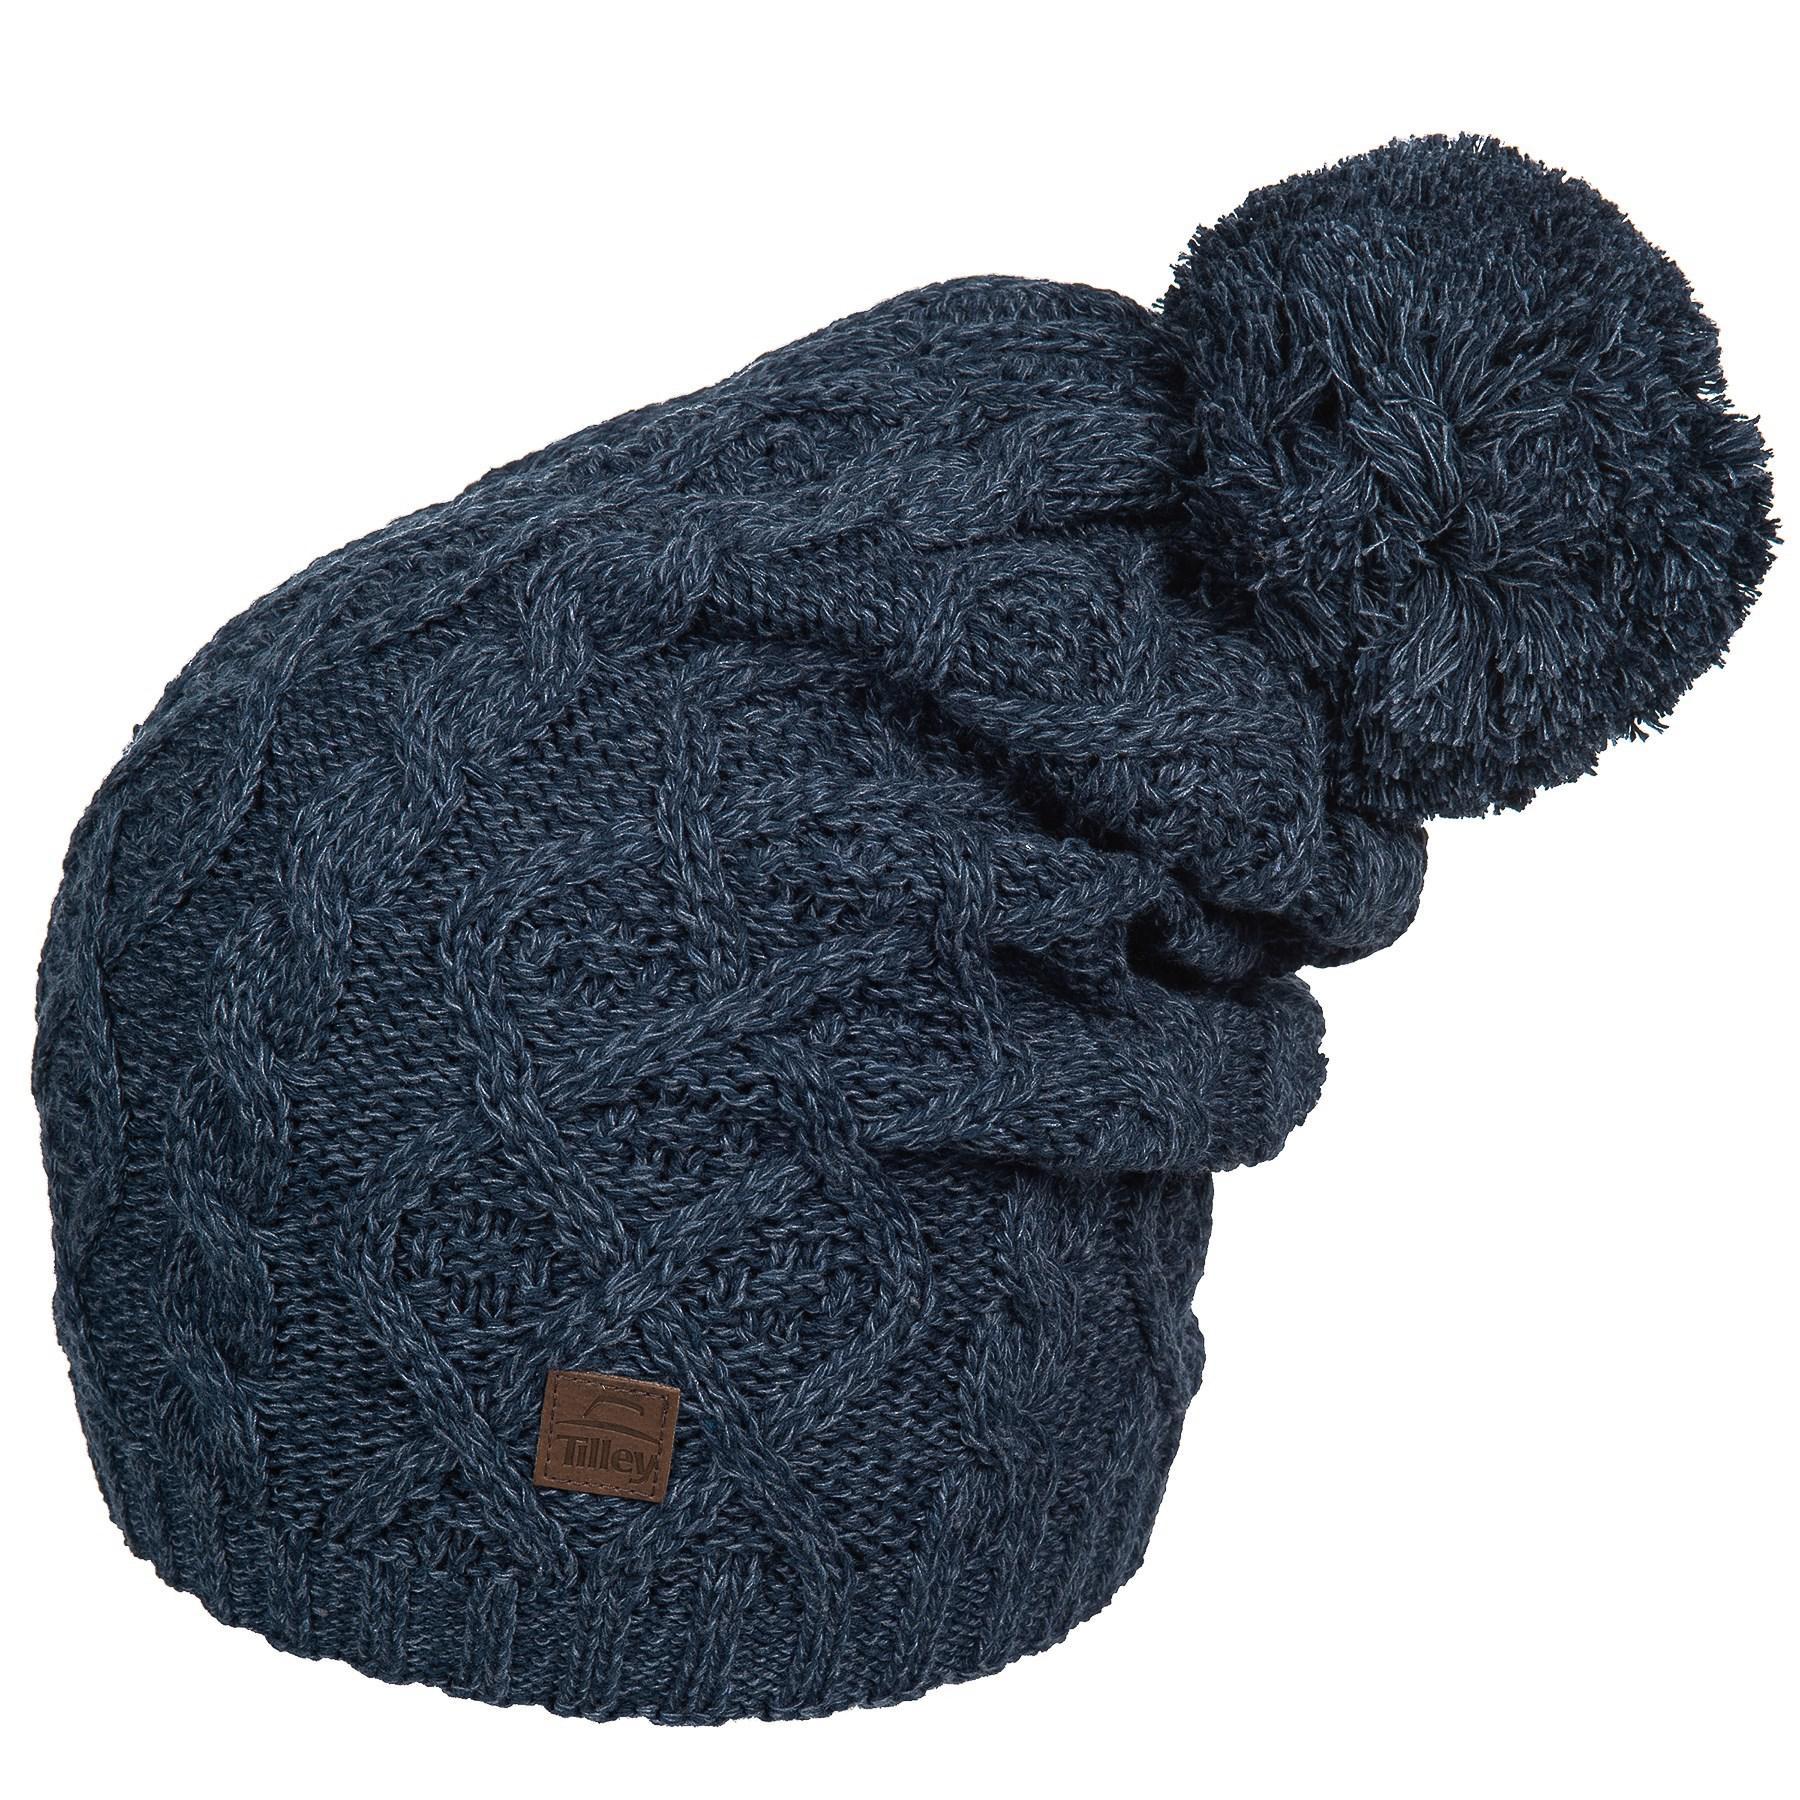 Lyst - Tilley Aspen Toque Hat (for Women) in Blue 77c6bb919